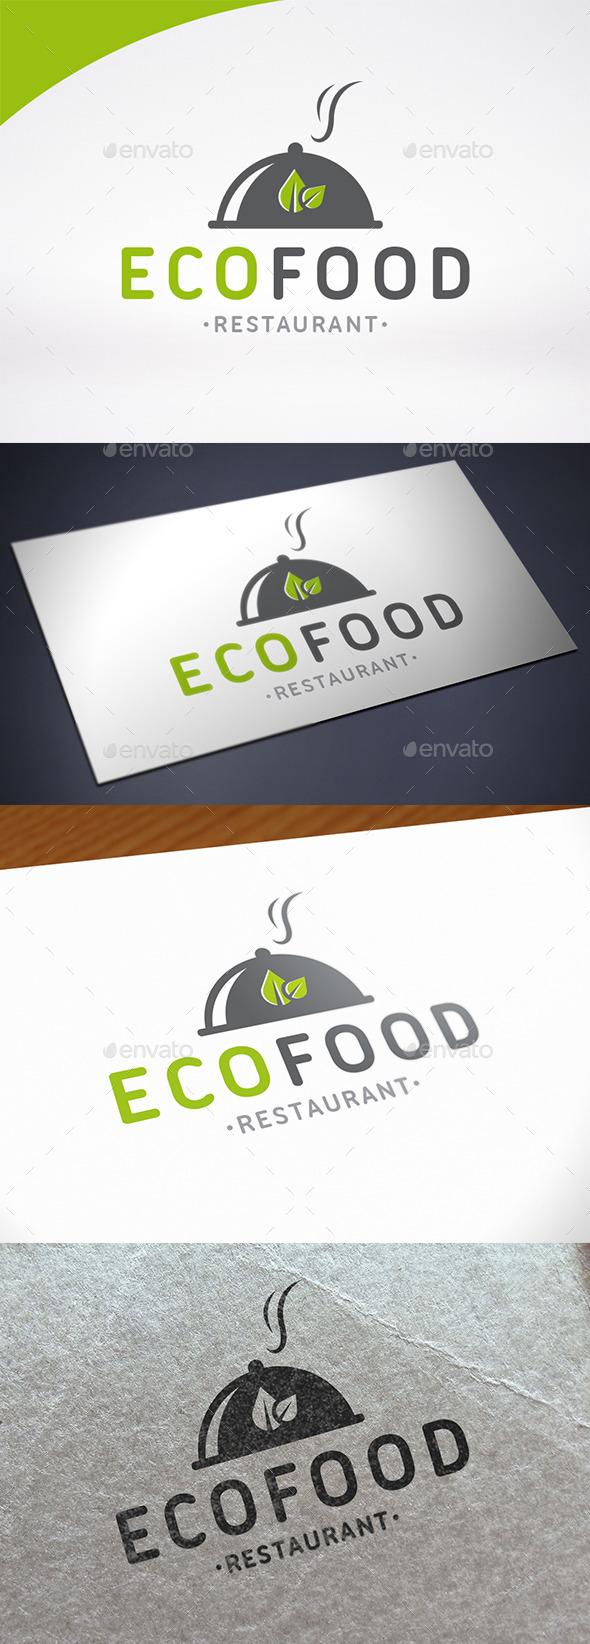 Eco Restaurant Logo Template - Restaurant Logo Templates